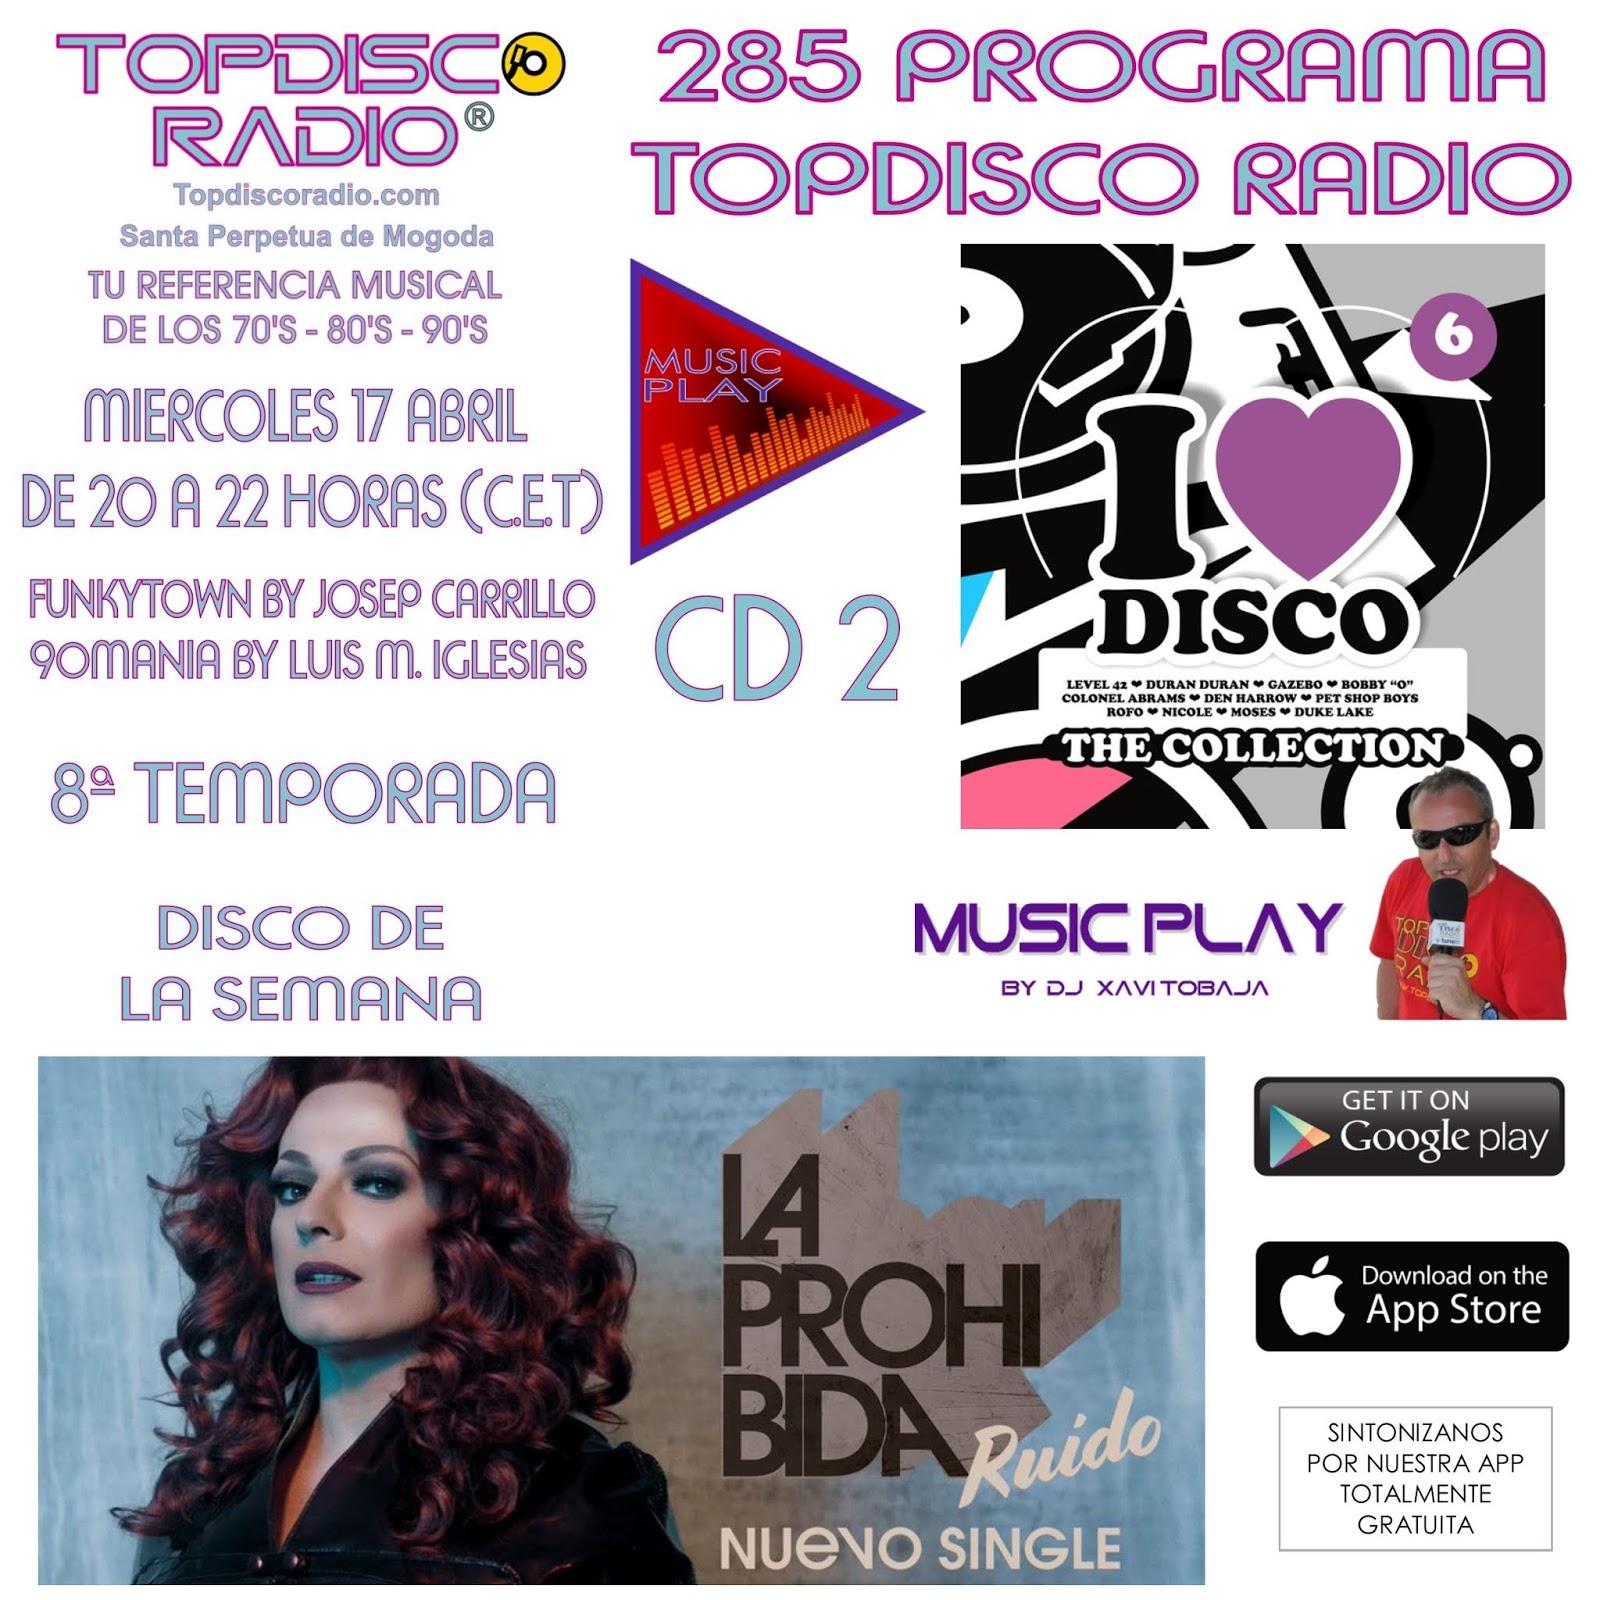 285 Programa Topdisco Radio